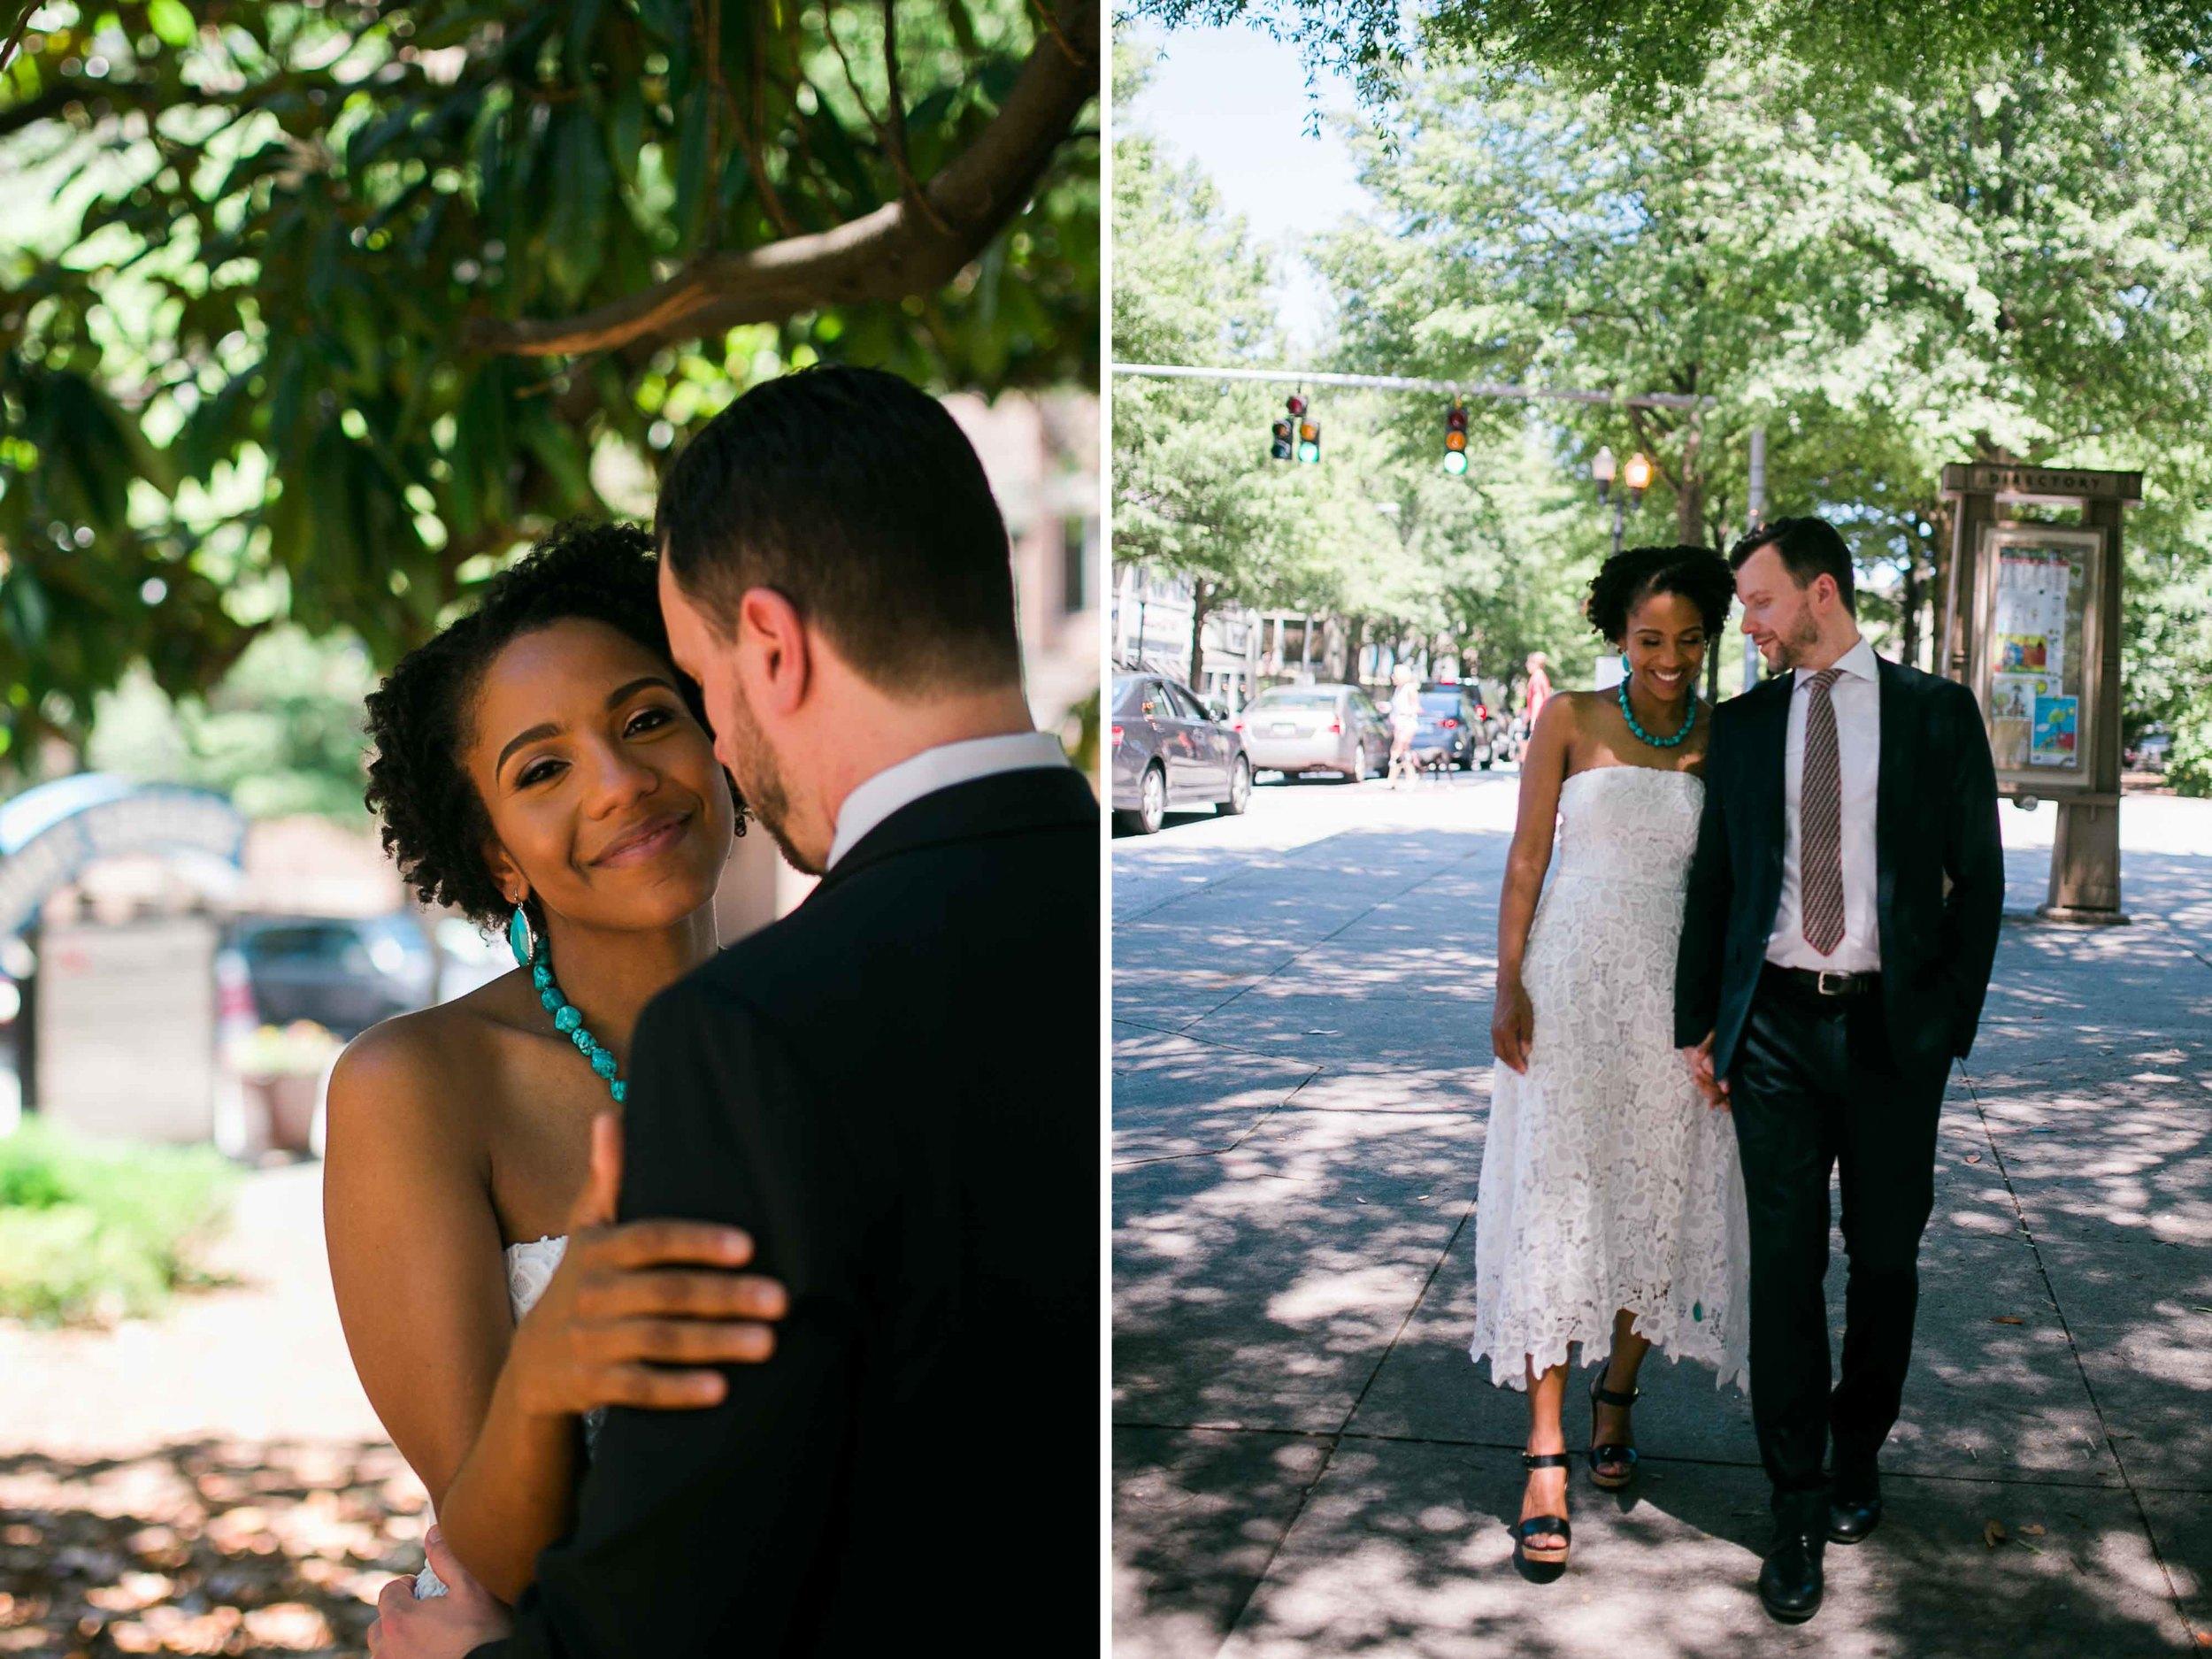 Dekalb-County-Courthouse-Wedding-Photos-Kiyah-C-Photography-76.jpg